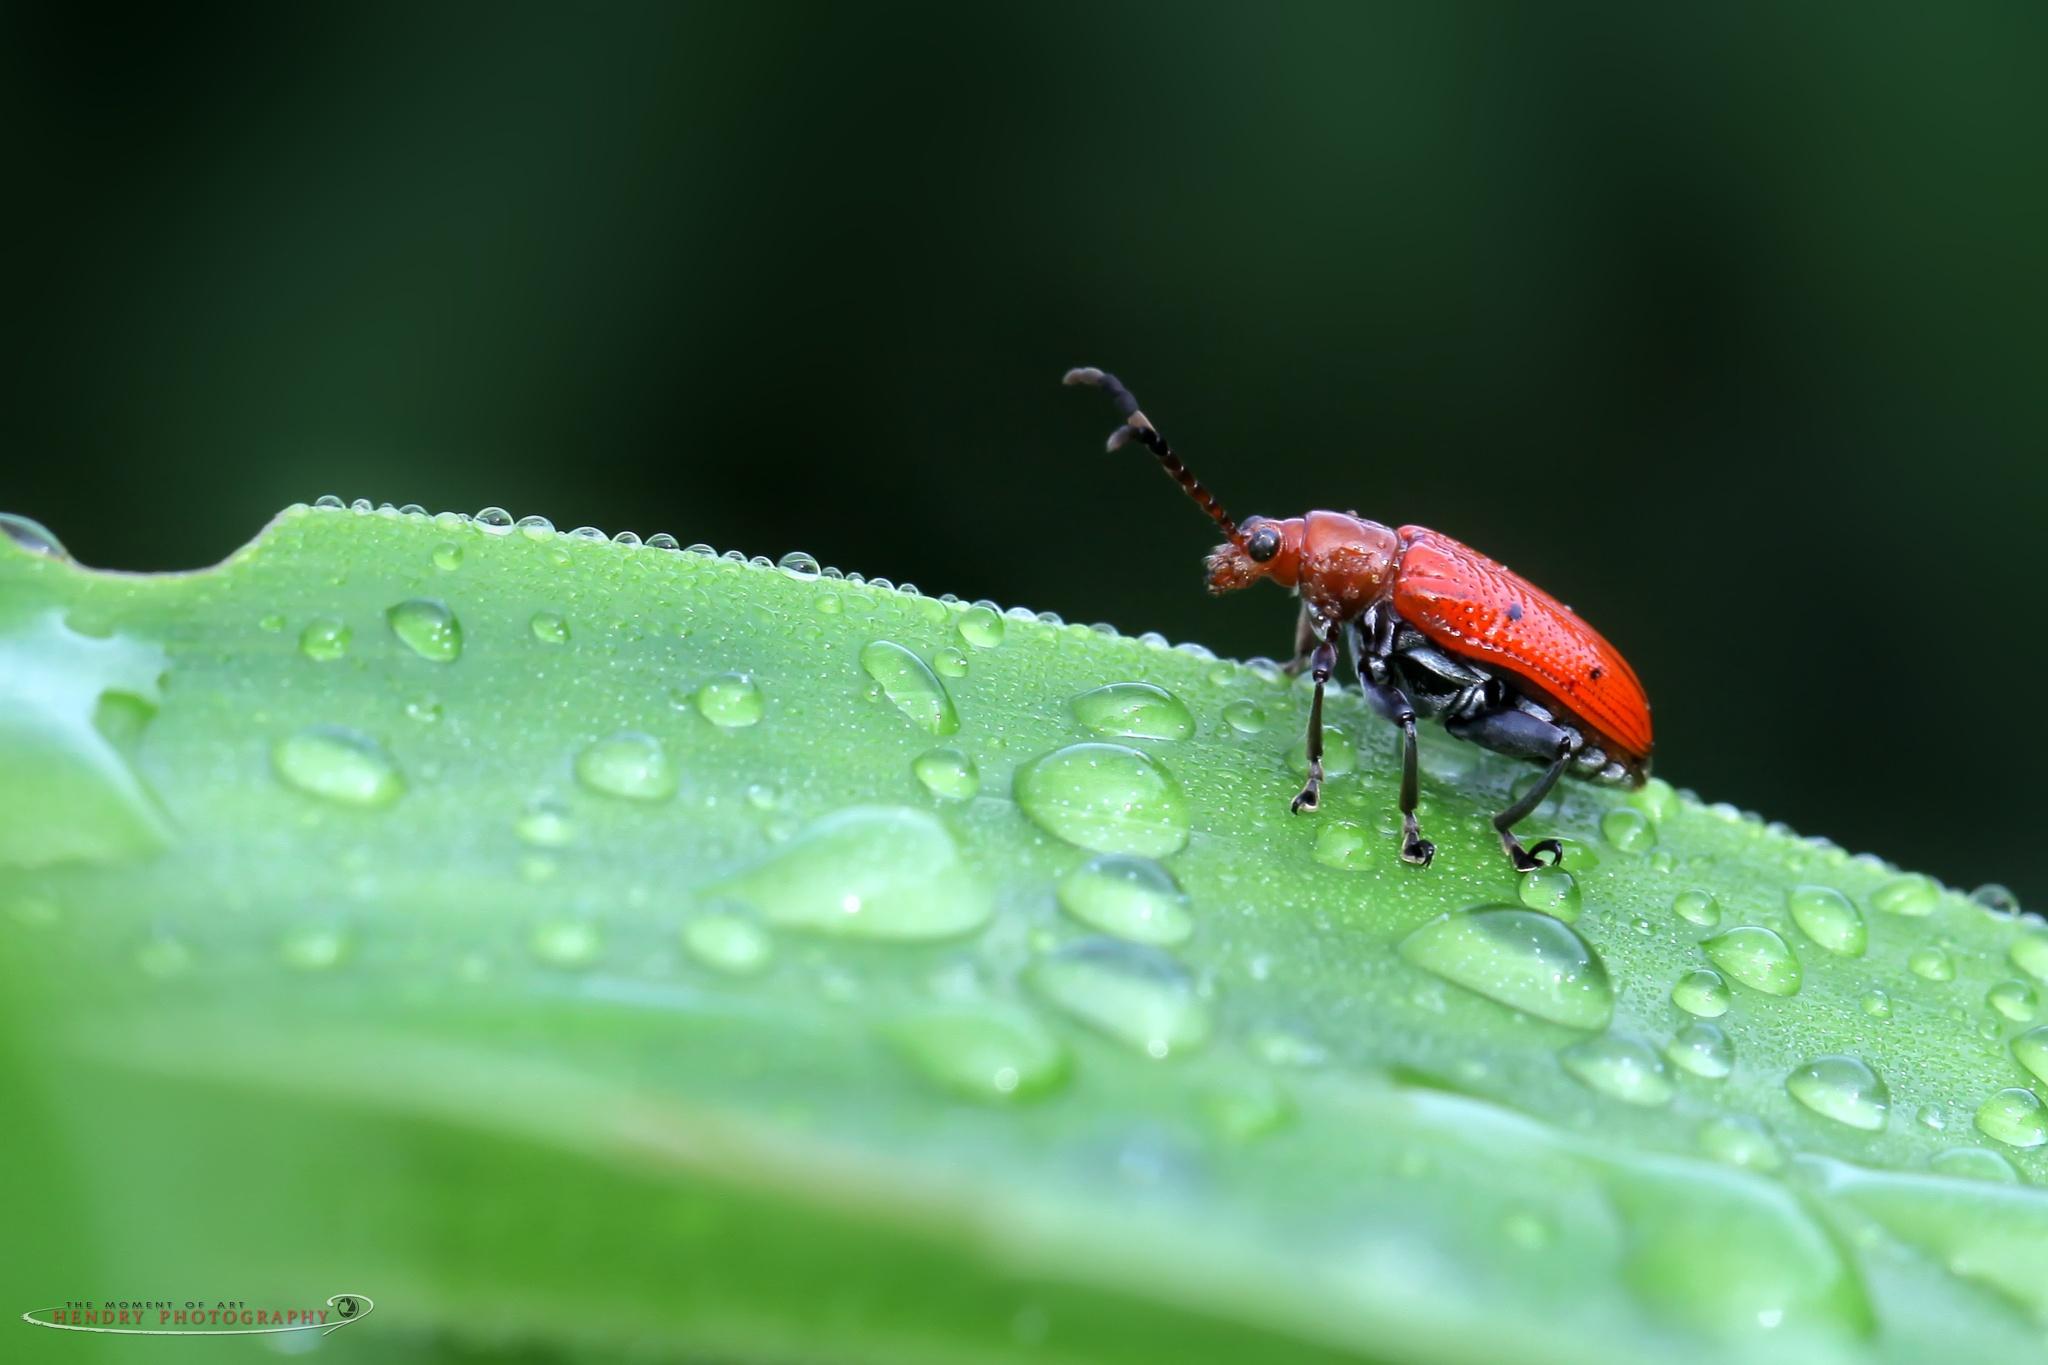 Mr. Bug Alone  by Hendry OK